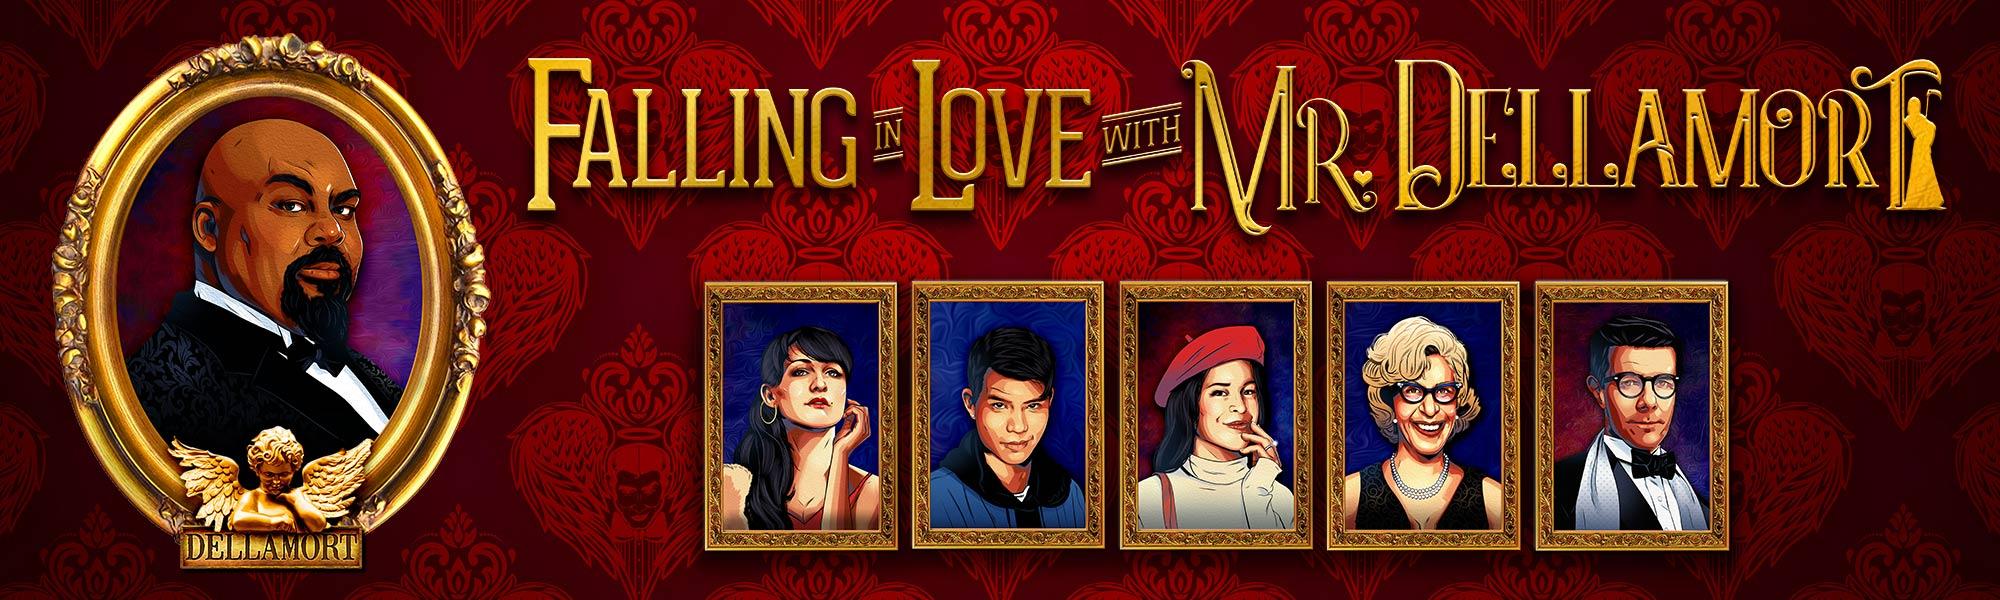 Falling in Love with Mr Dellamort - banner